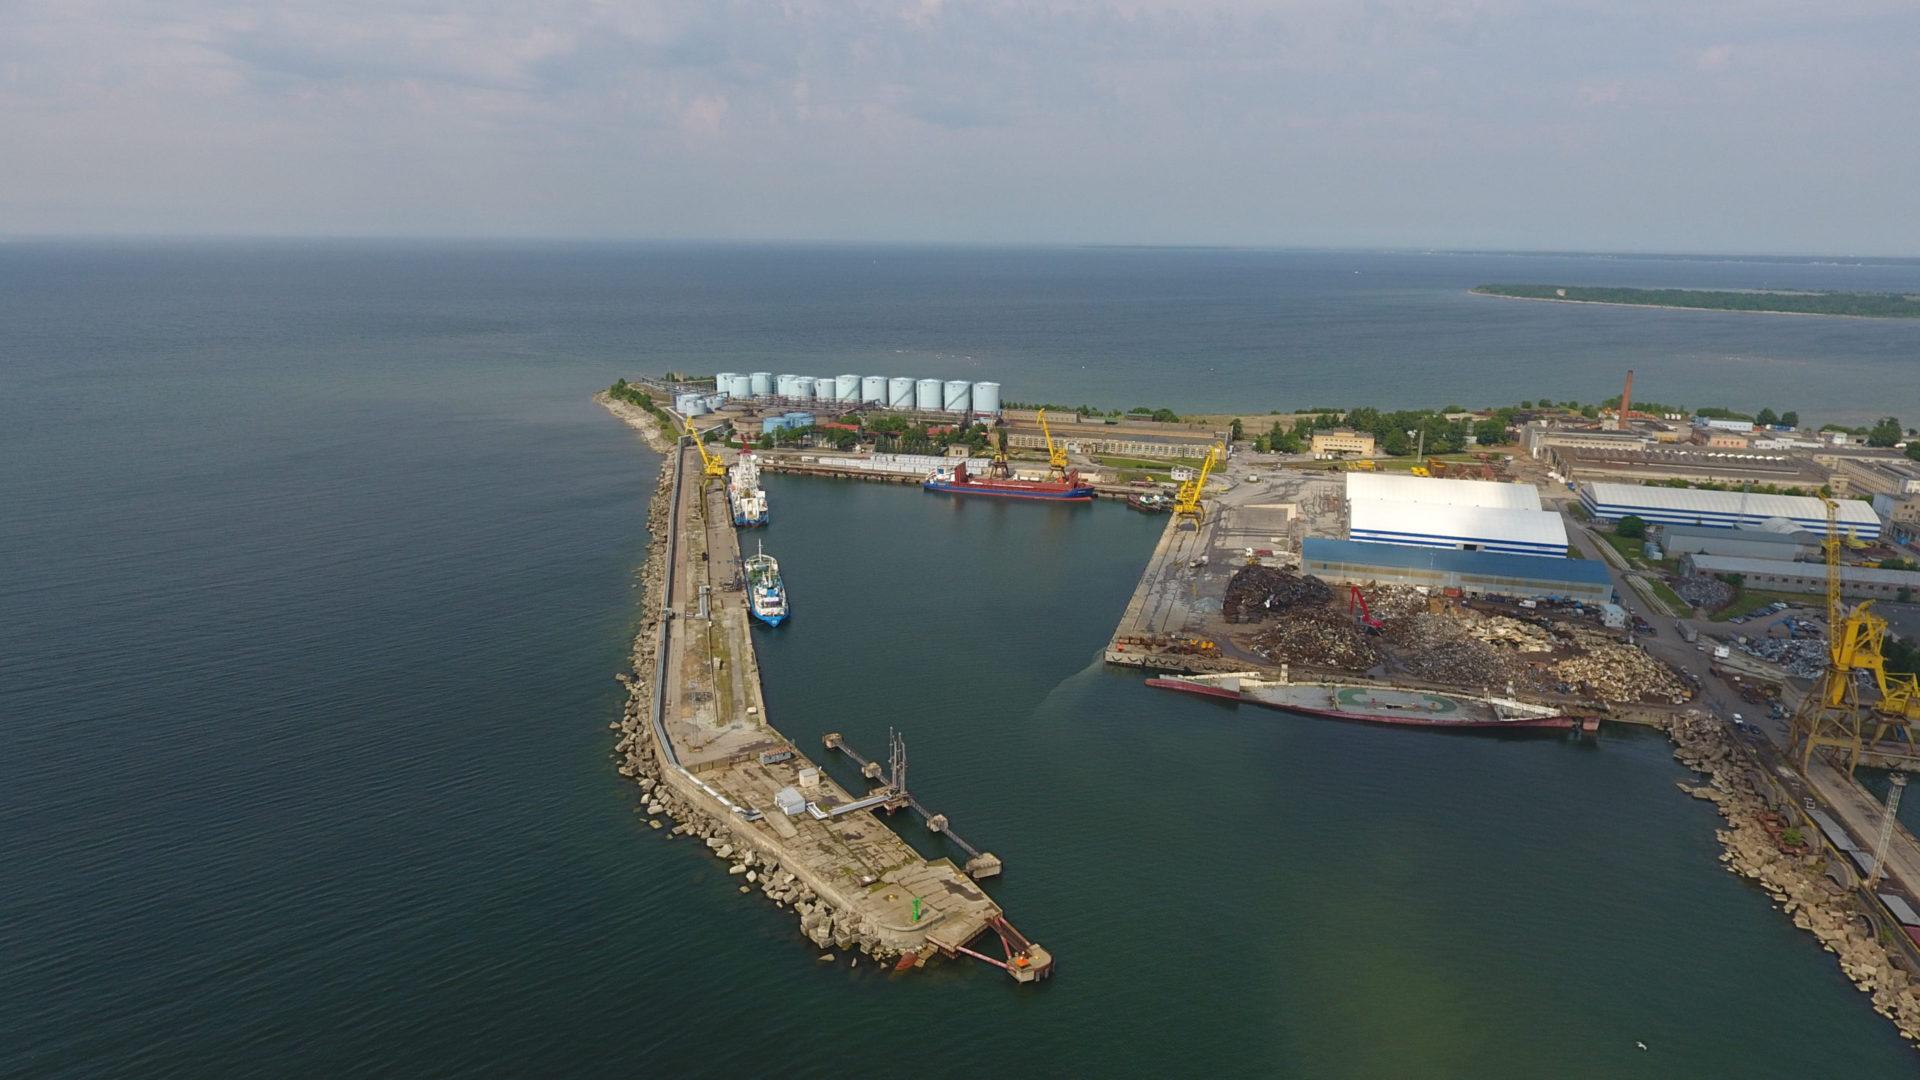 Piers 4-5 of the BLRT Shipyard, Tallinn, Estonia